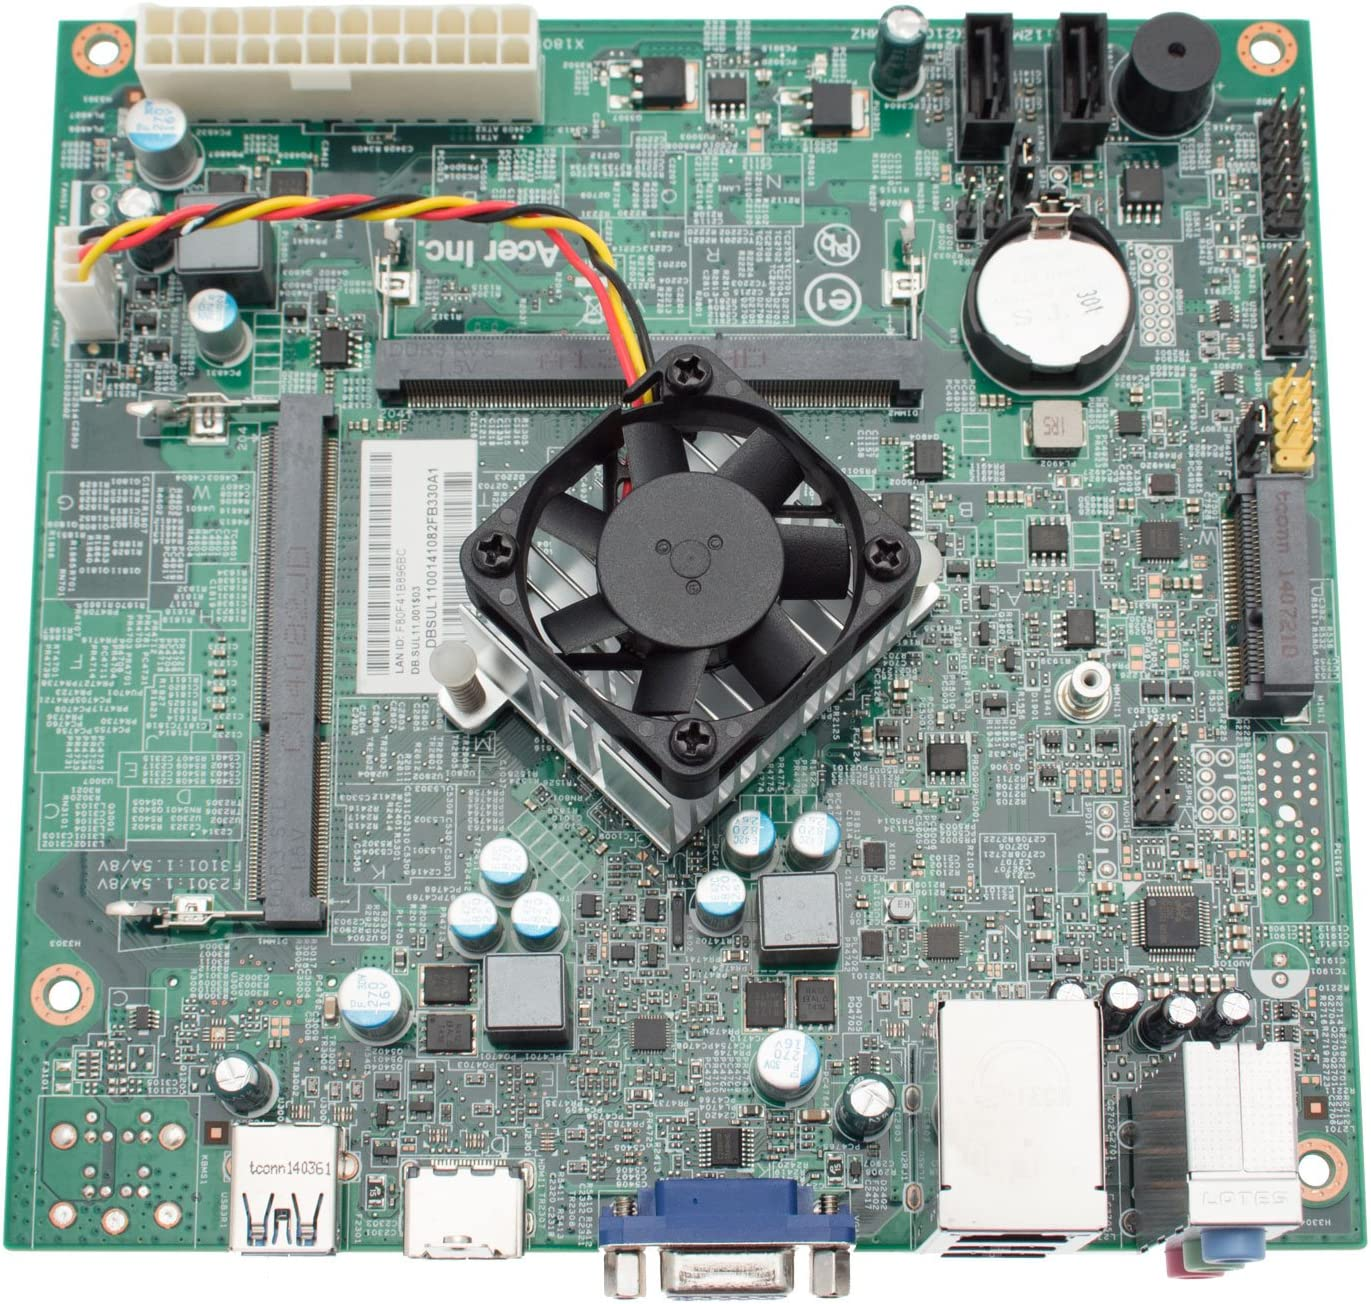 ACER DB.SUL11.001 Acer Aspire AXC-603G Desktop Motherboard w/Intel Celeron J1900 Your Motherboard is DB.SUL11.001